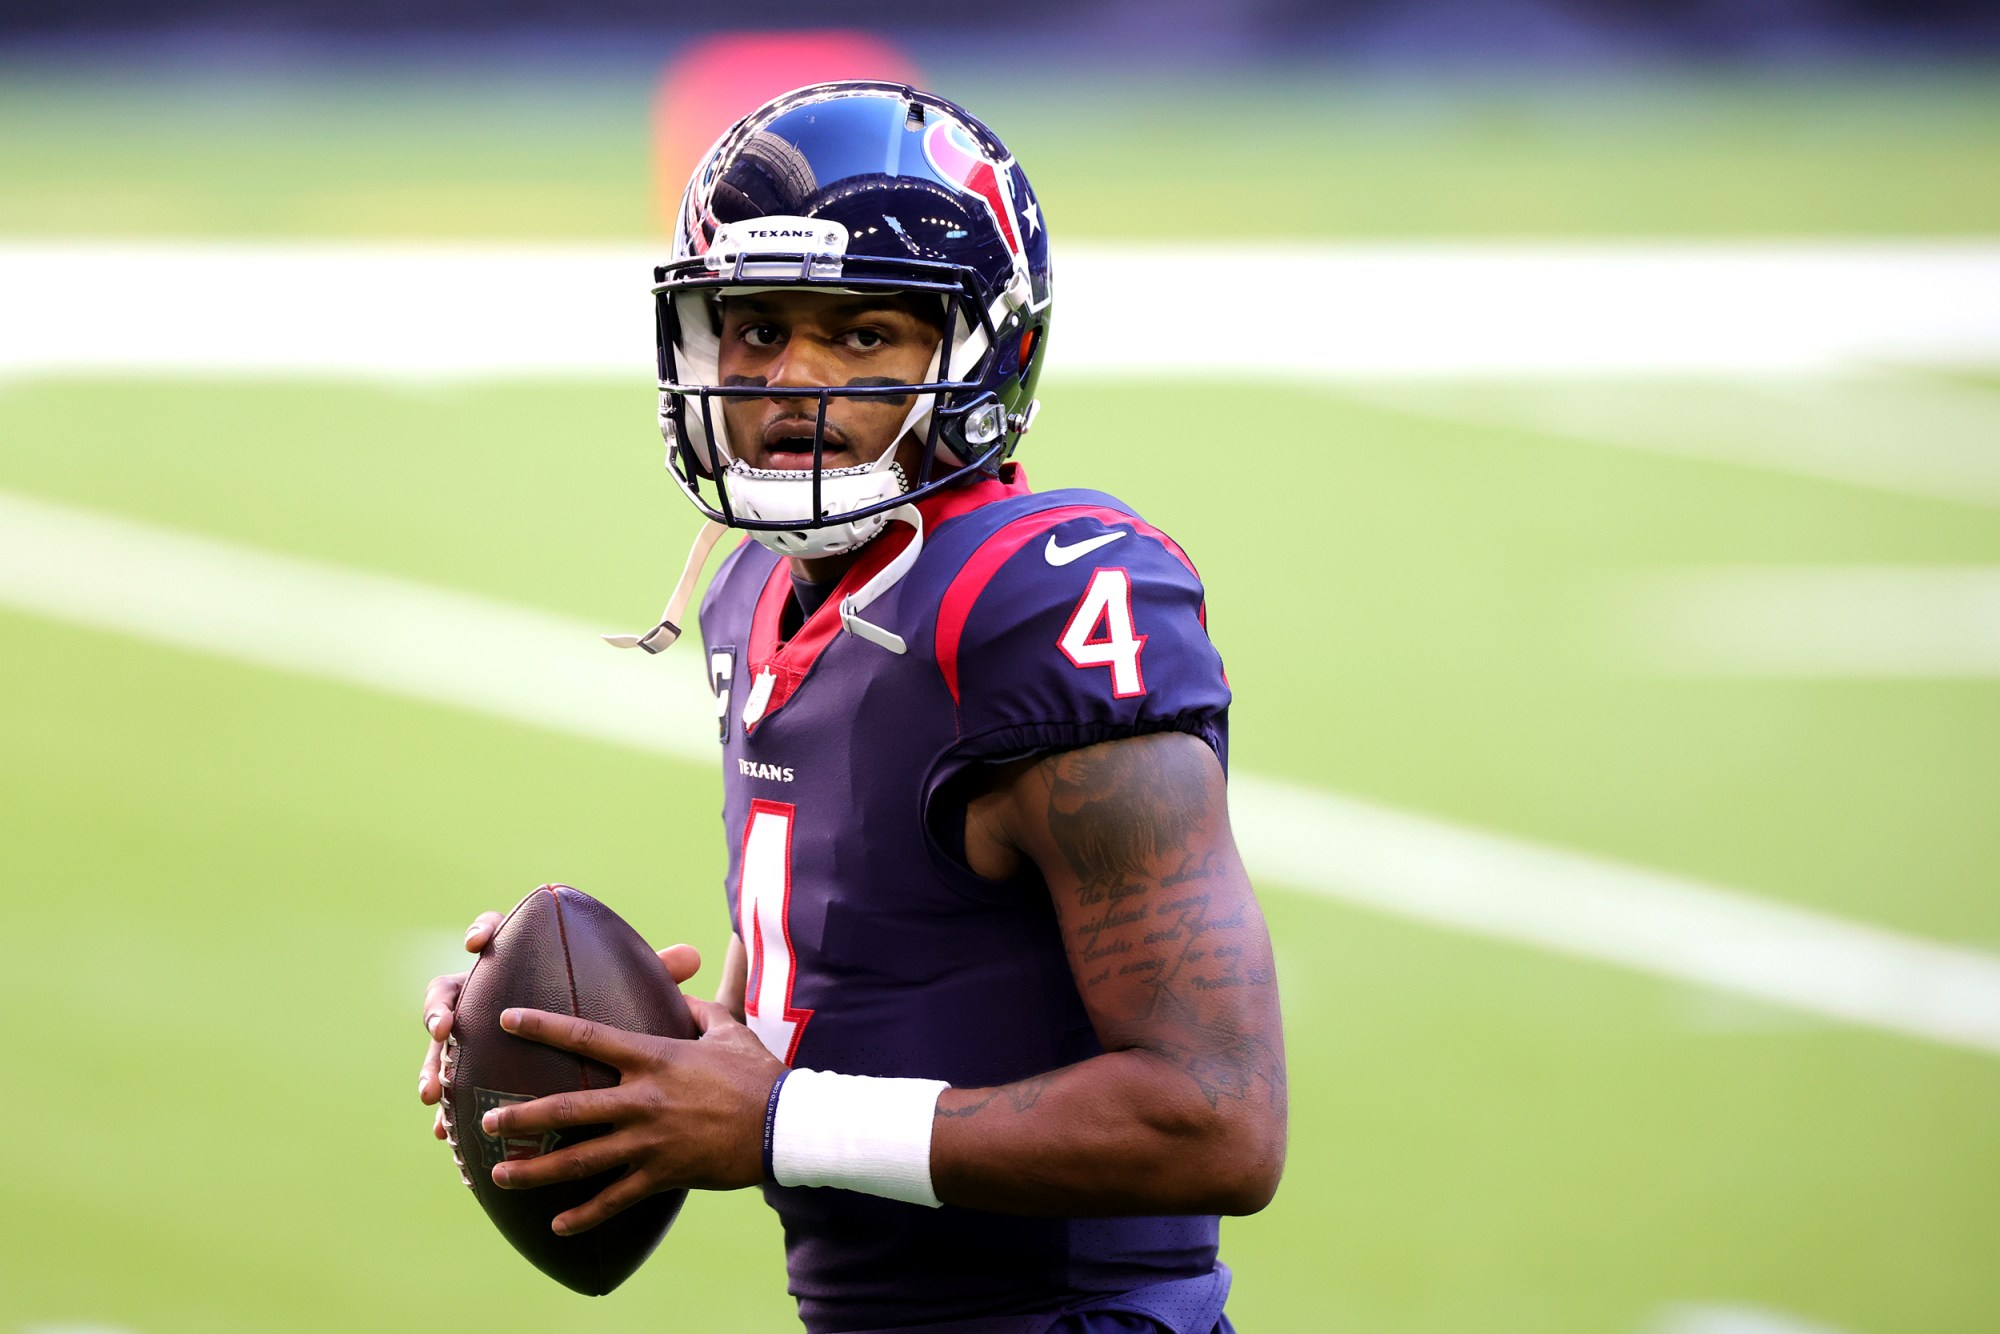 Texans Open to Trading Deshaun Watson